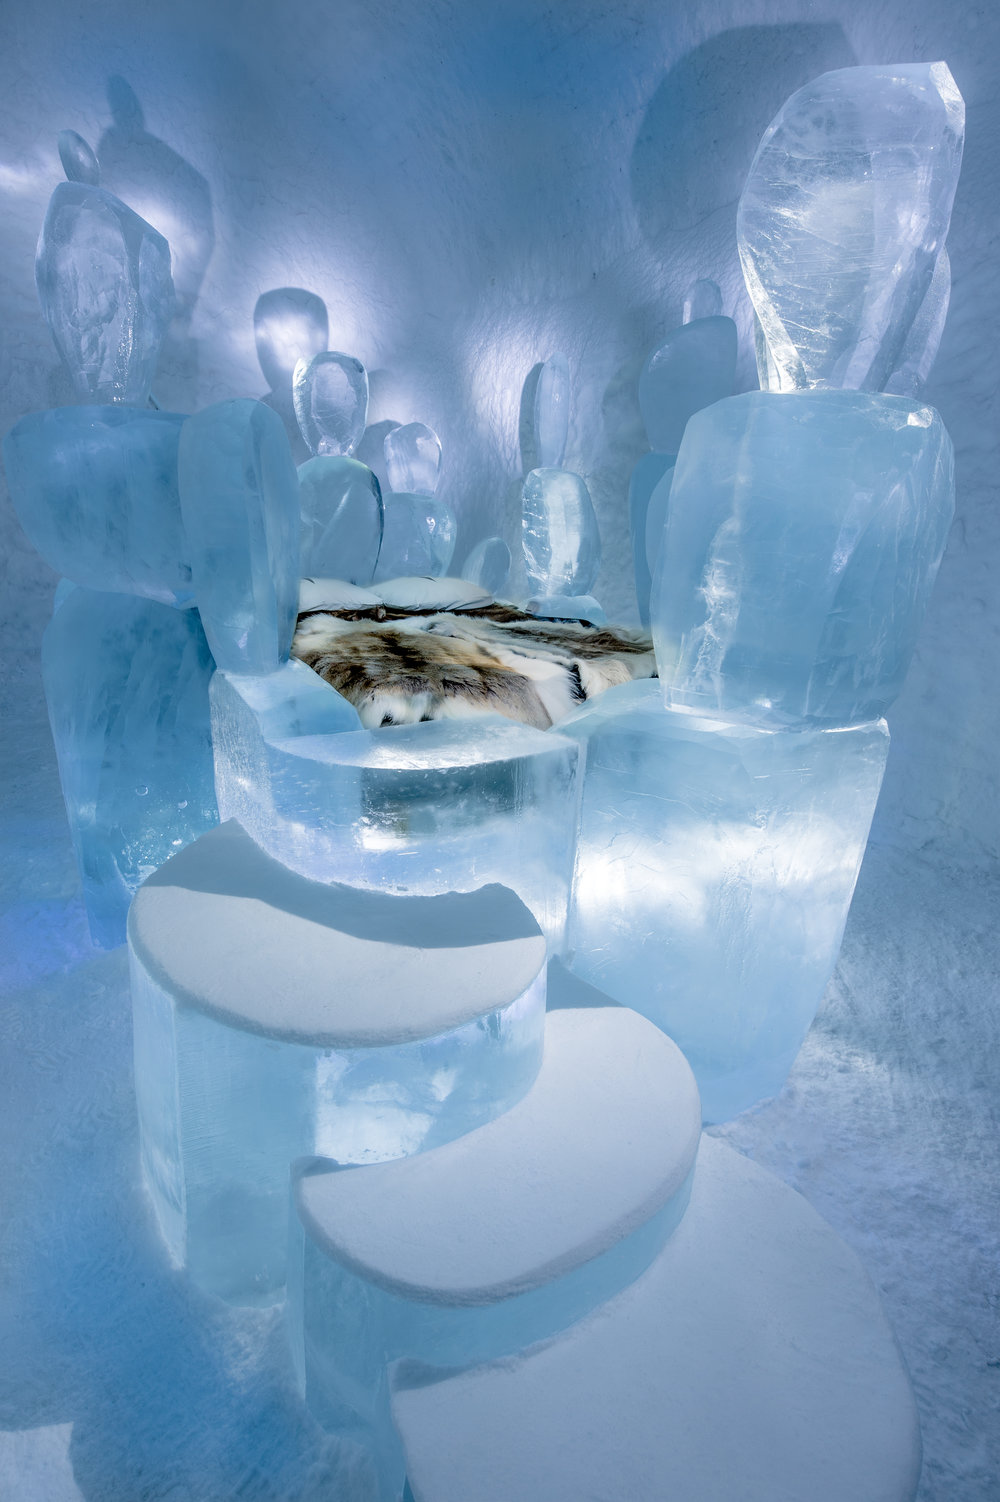 Deluxe suite-AnnaSofia Mååg, Sofi Ruotsalainen, Pick Your mustache! icehotel 365-- by asaf kliger.jpg